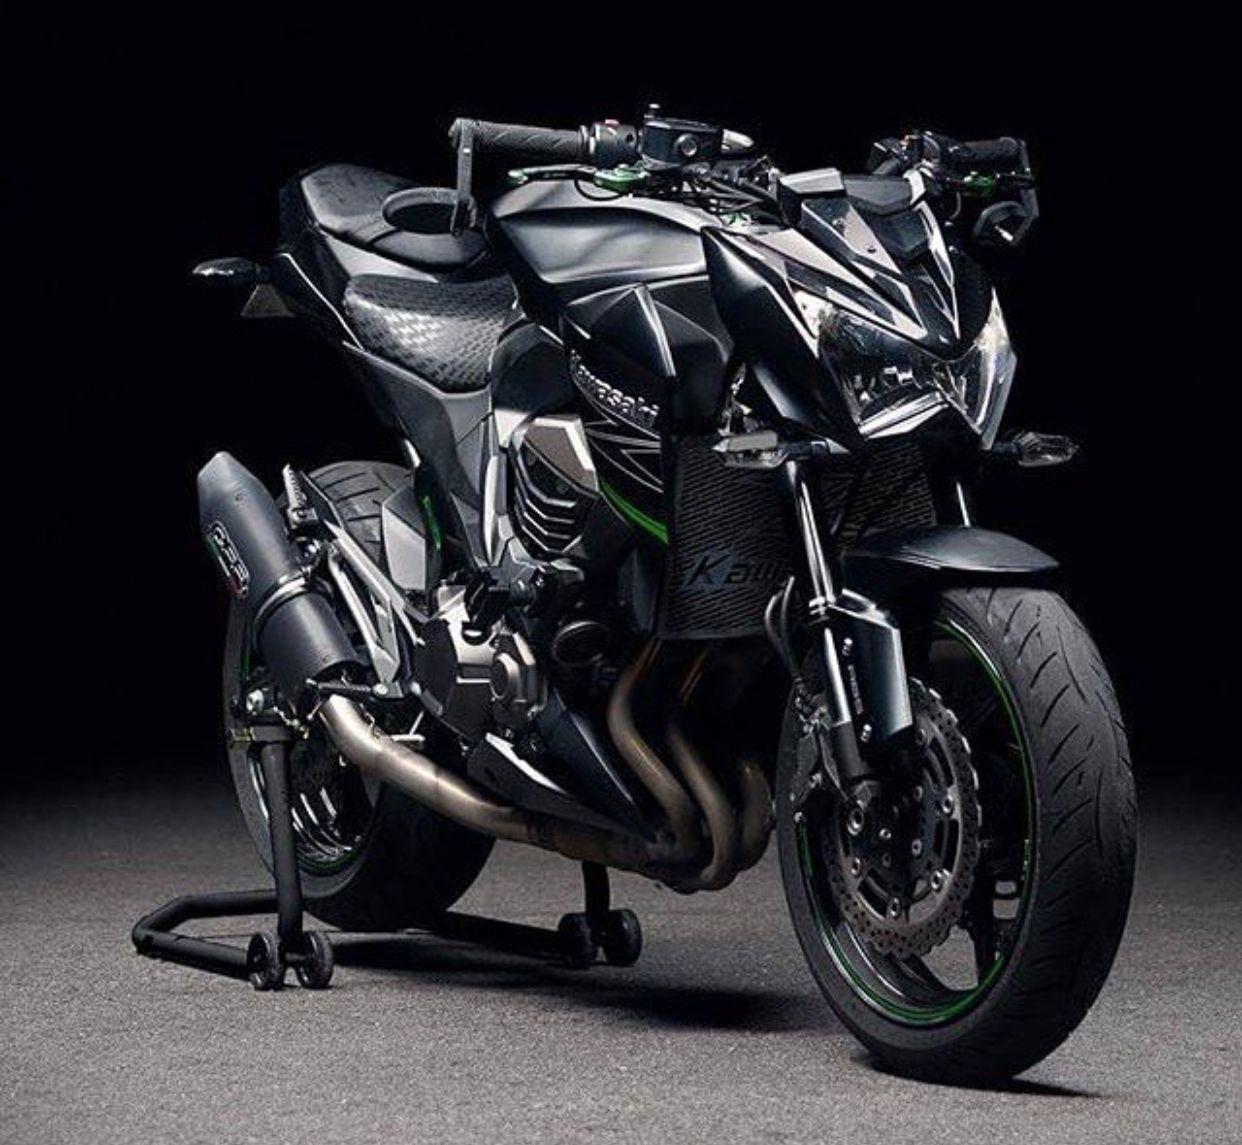 Обои Kawasaki, Мотоцикл, z800. Мотоциклы foto 9